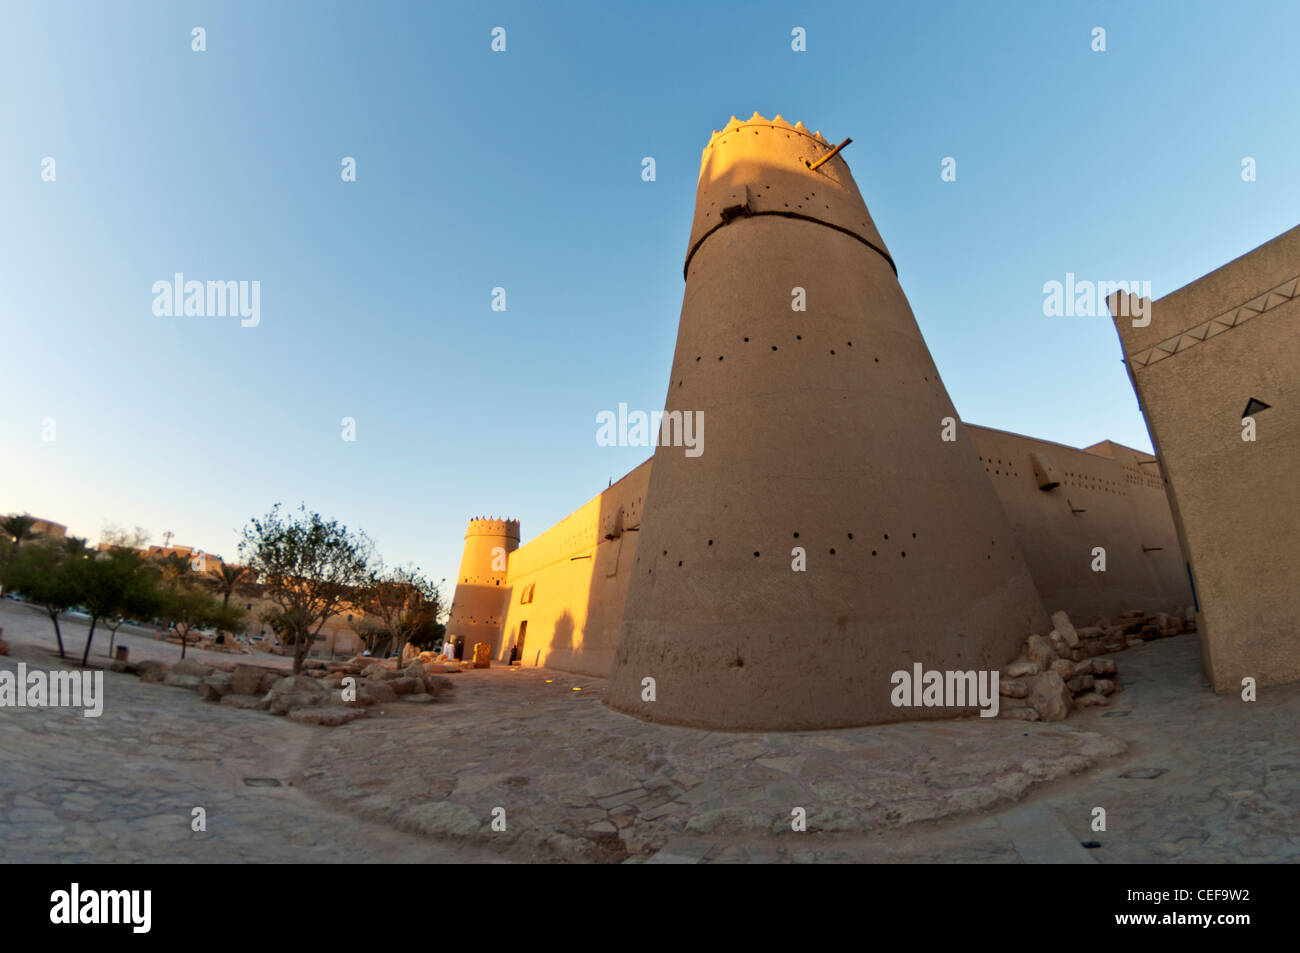 fort walls of Al-Masmak fort in Riyadh Saudi Arabia - Stock Image